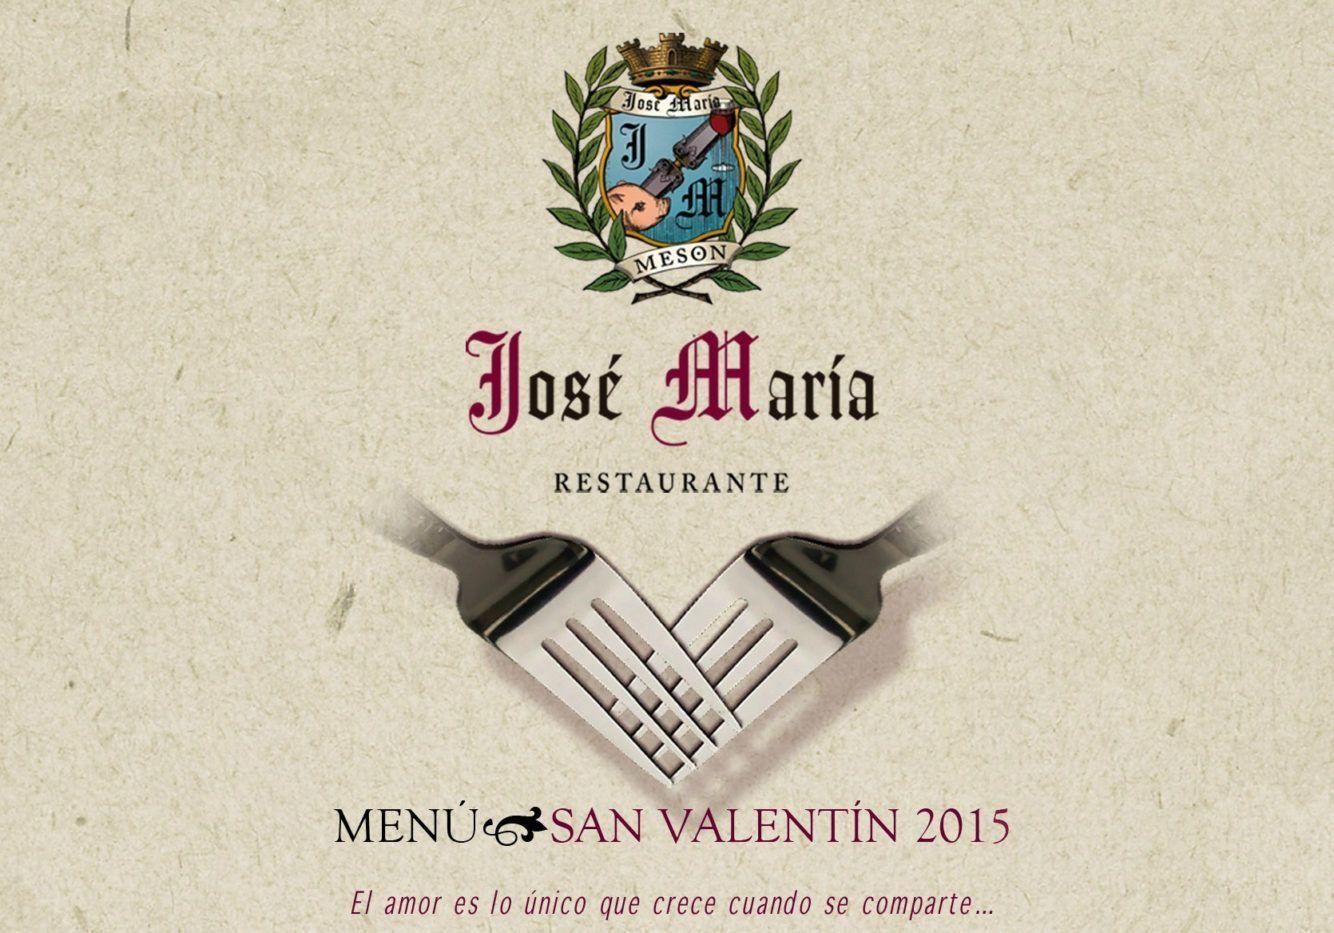 menu san valentin 2015